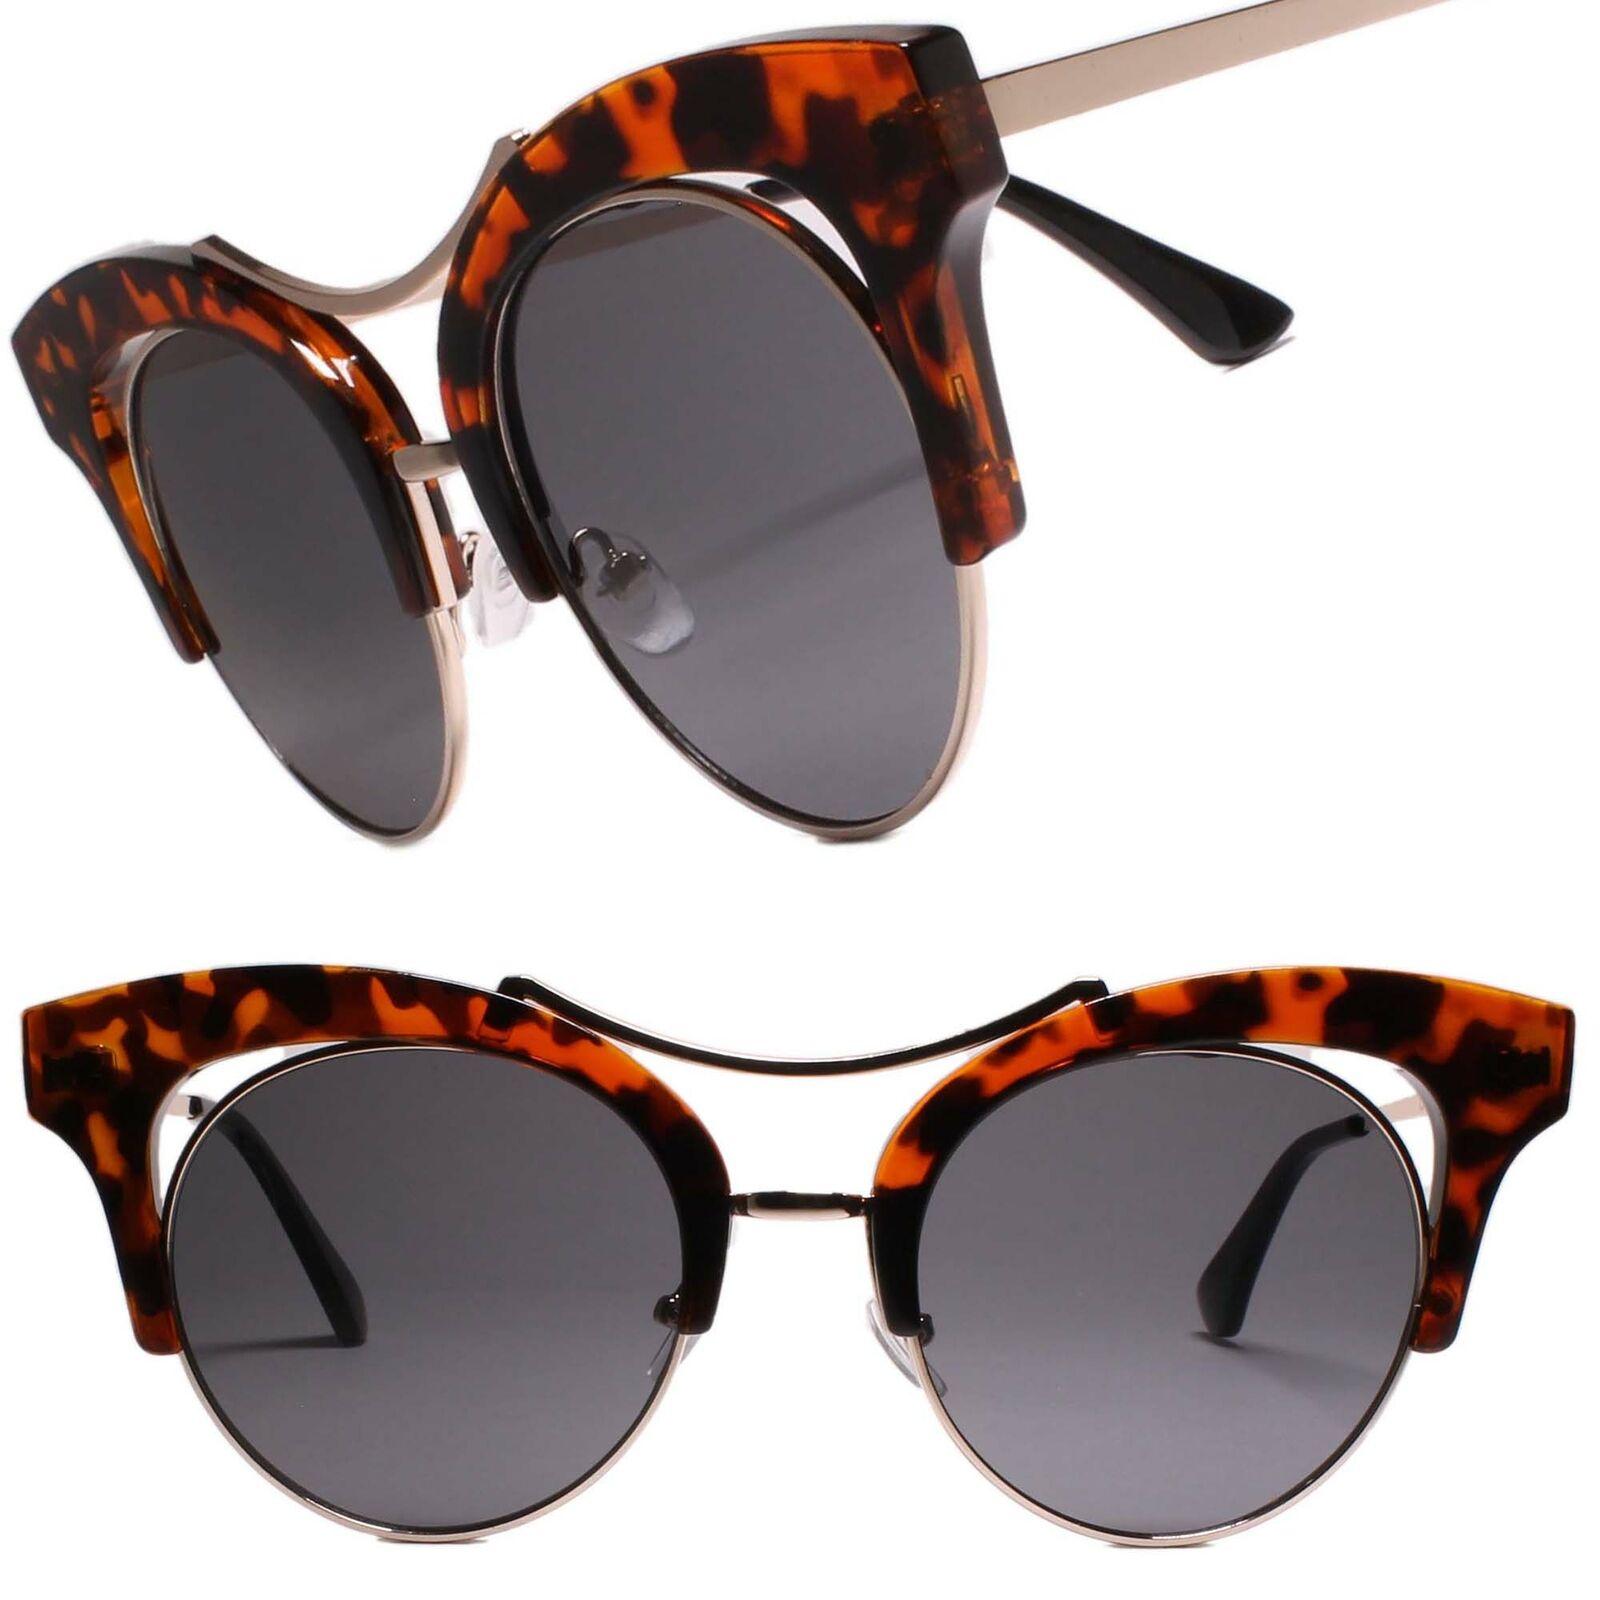 Fancy Elegant Fashionable Womens Round Lens Cat Eye Sunglasses Tortoise Frame